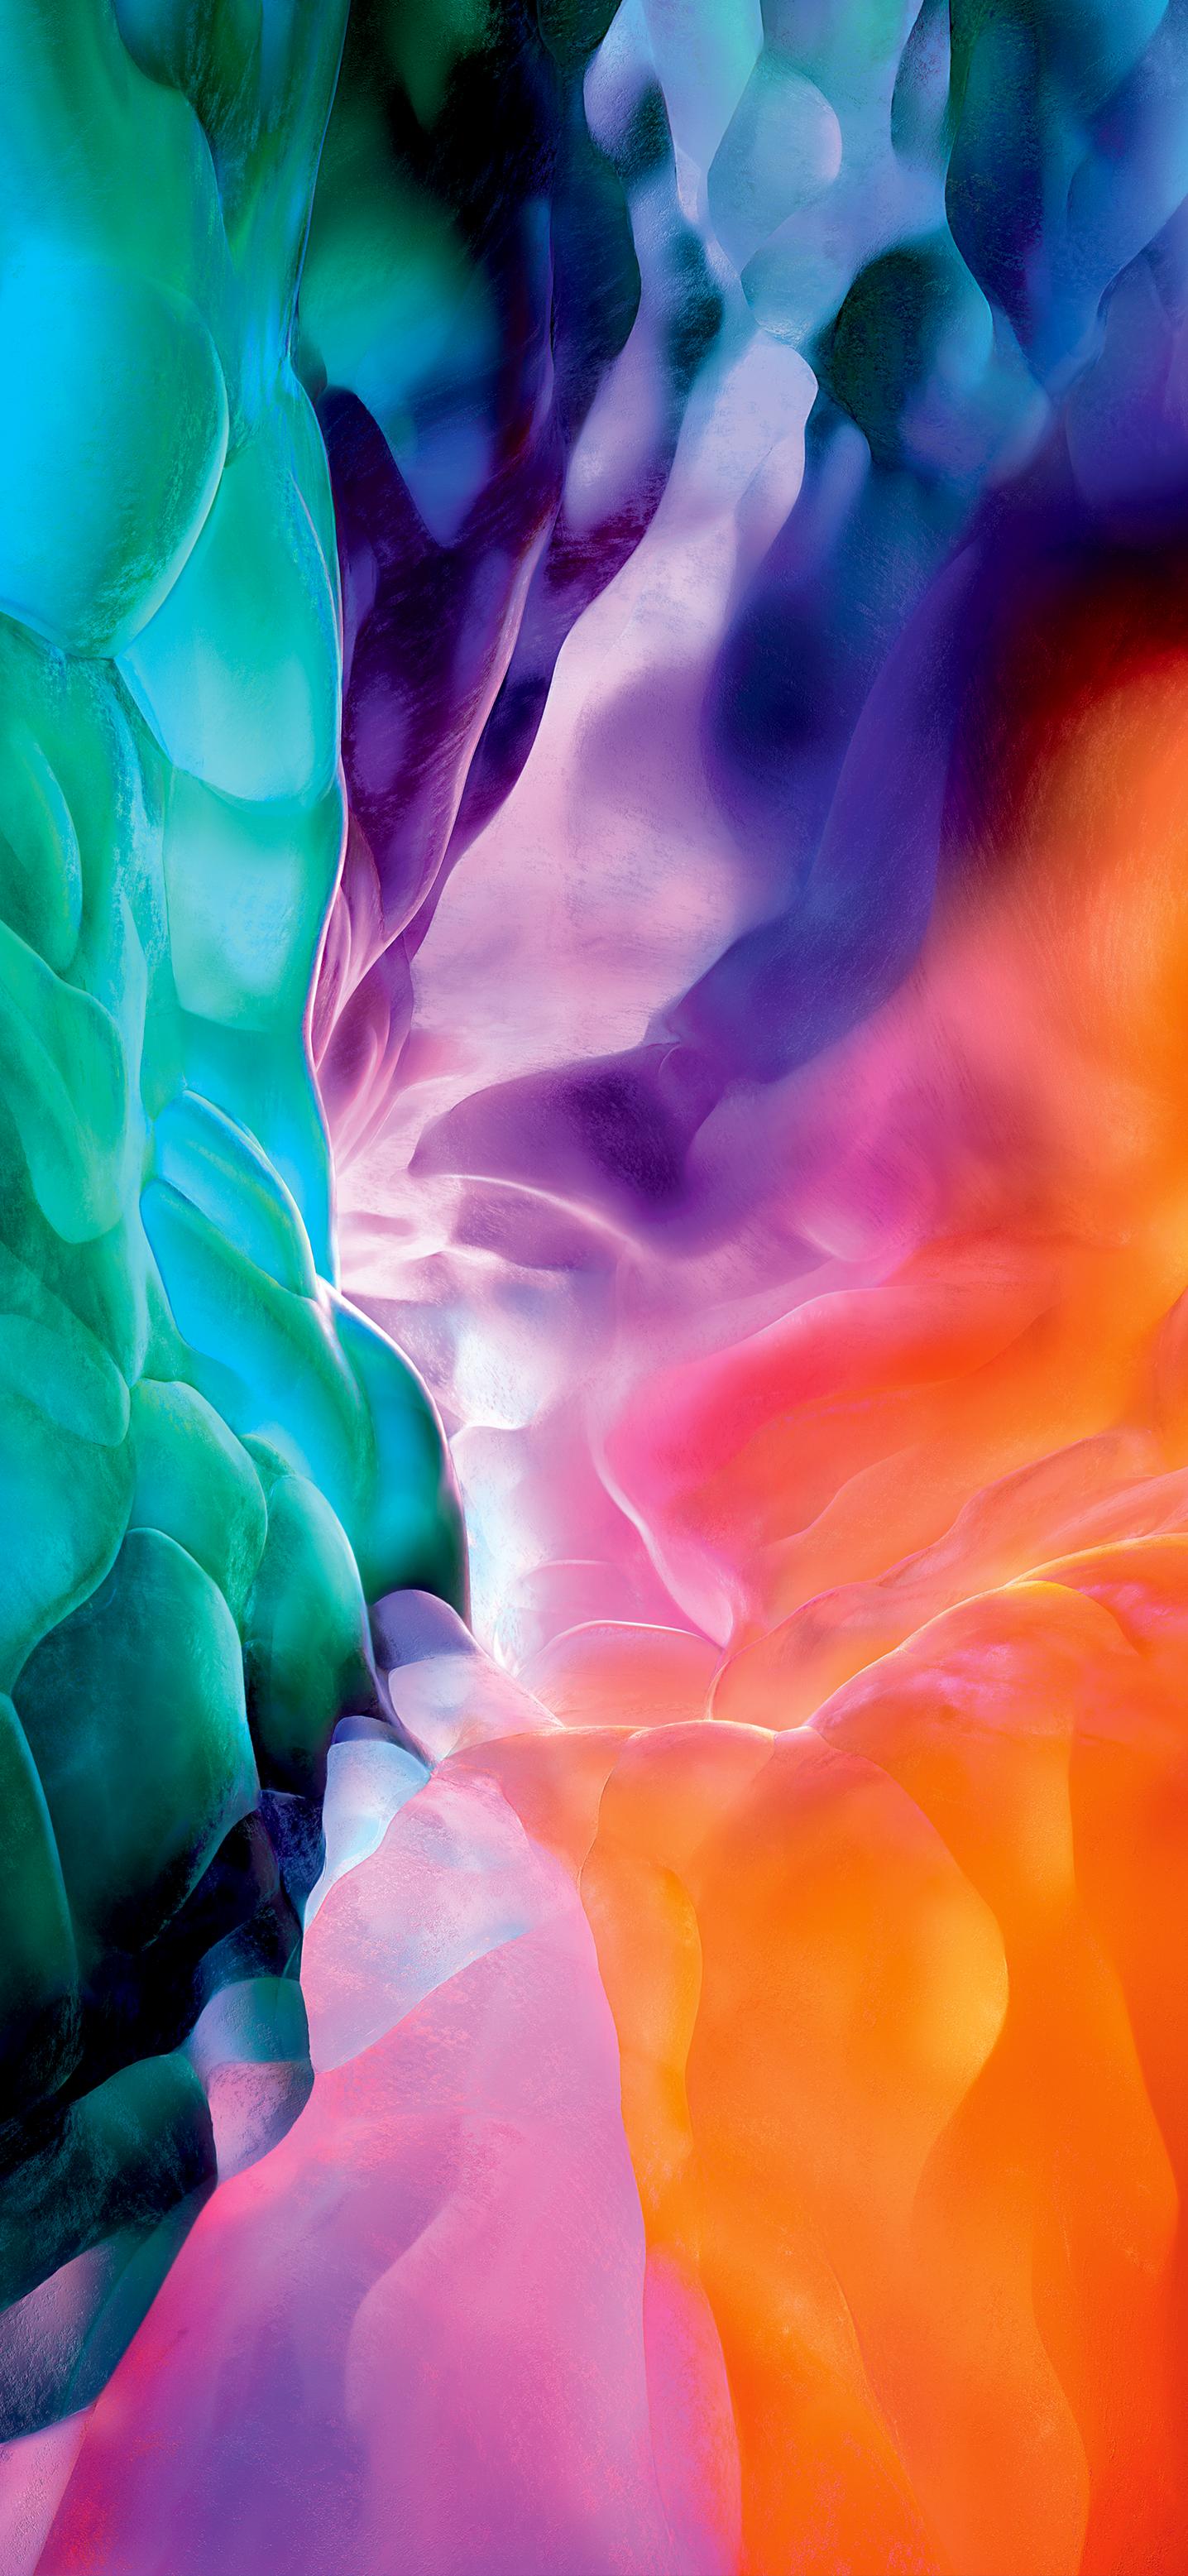 Ipad Pro Wallpaper Ytechb Exclusive Ipad Pro Wallpaper Ipad Pro Wallpaper Hd Abstract Iphone Wallpaper